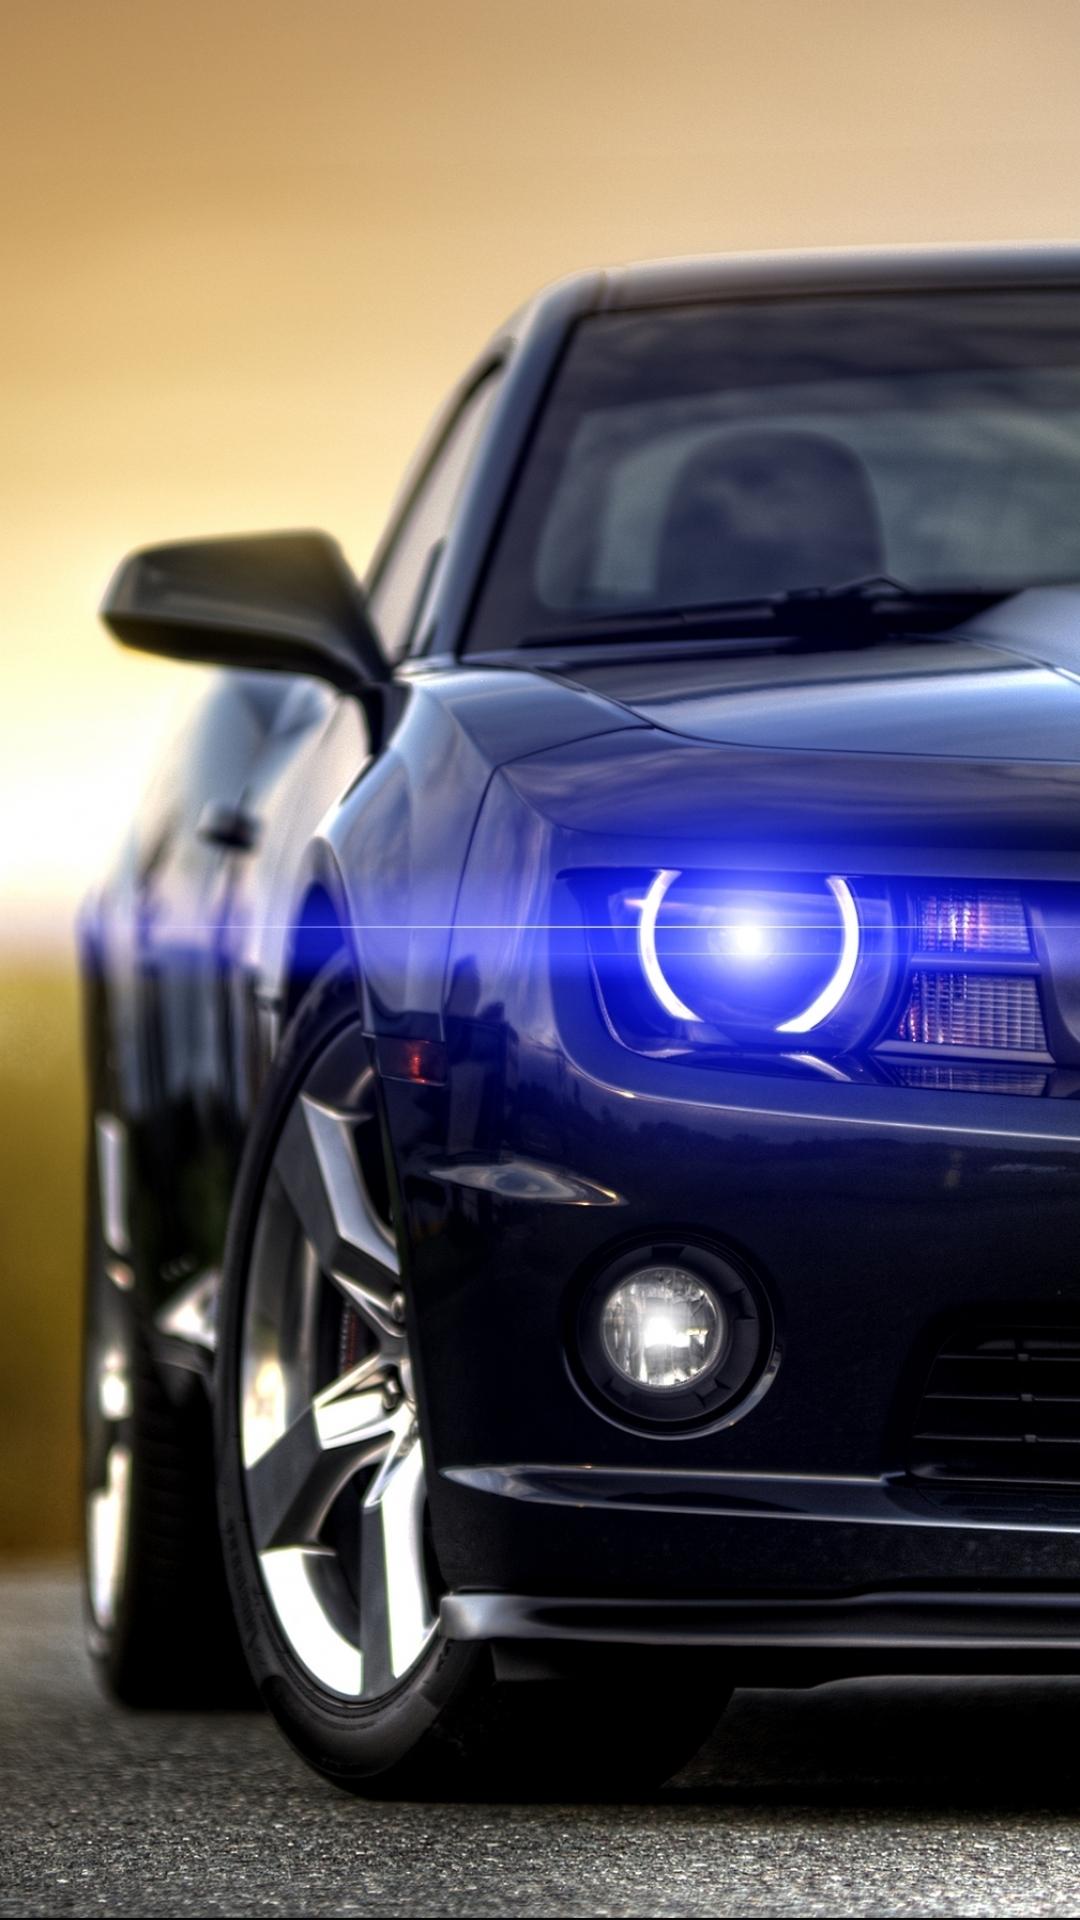 Chevrolet Camaro Ss Car Mobile Wallpaper 1080x1920 14461 2273652488